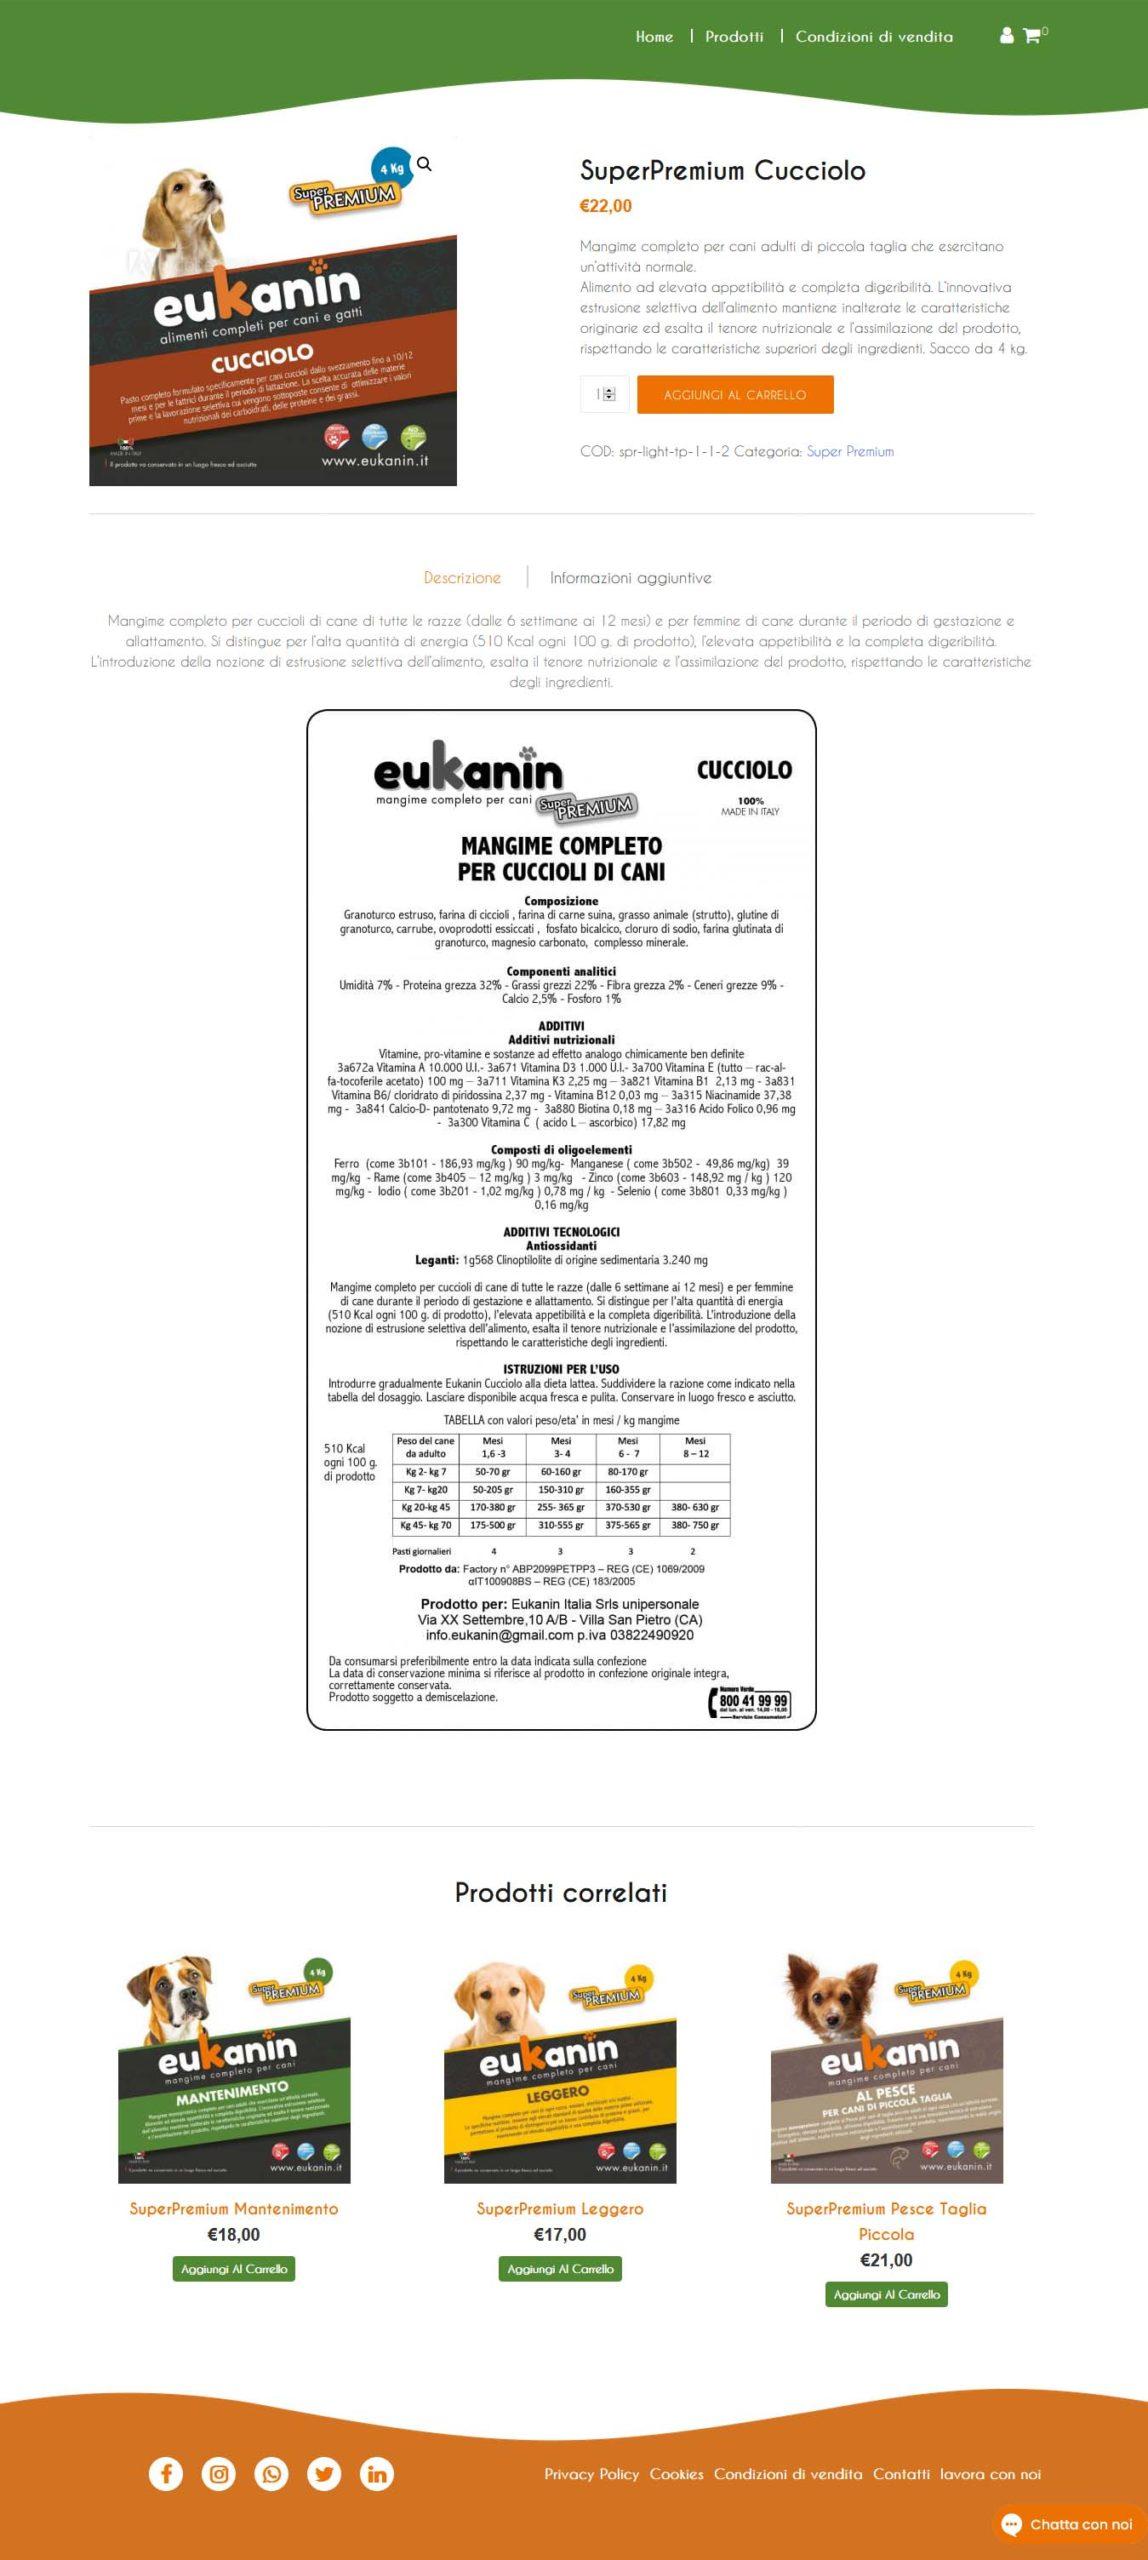 Screenshot_2021-01-06 SuperPremium Cucciolo - Eukanin - alimenti per cani e gatti